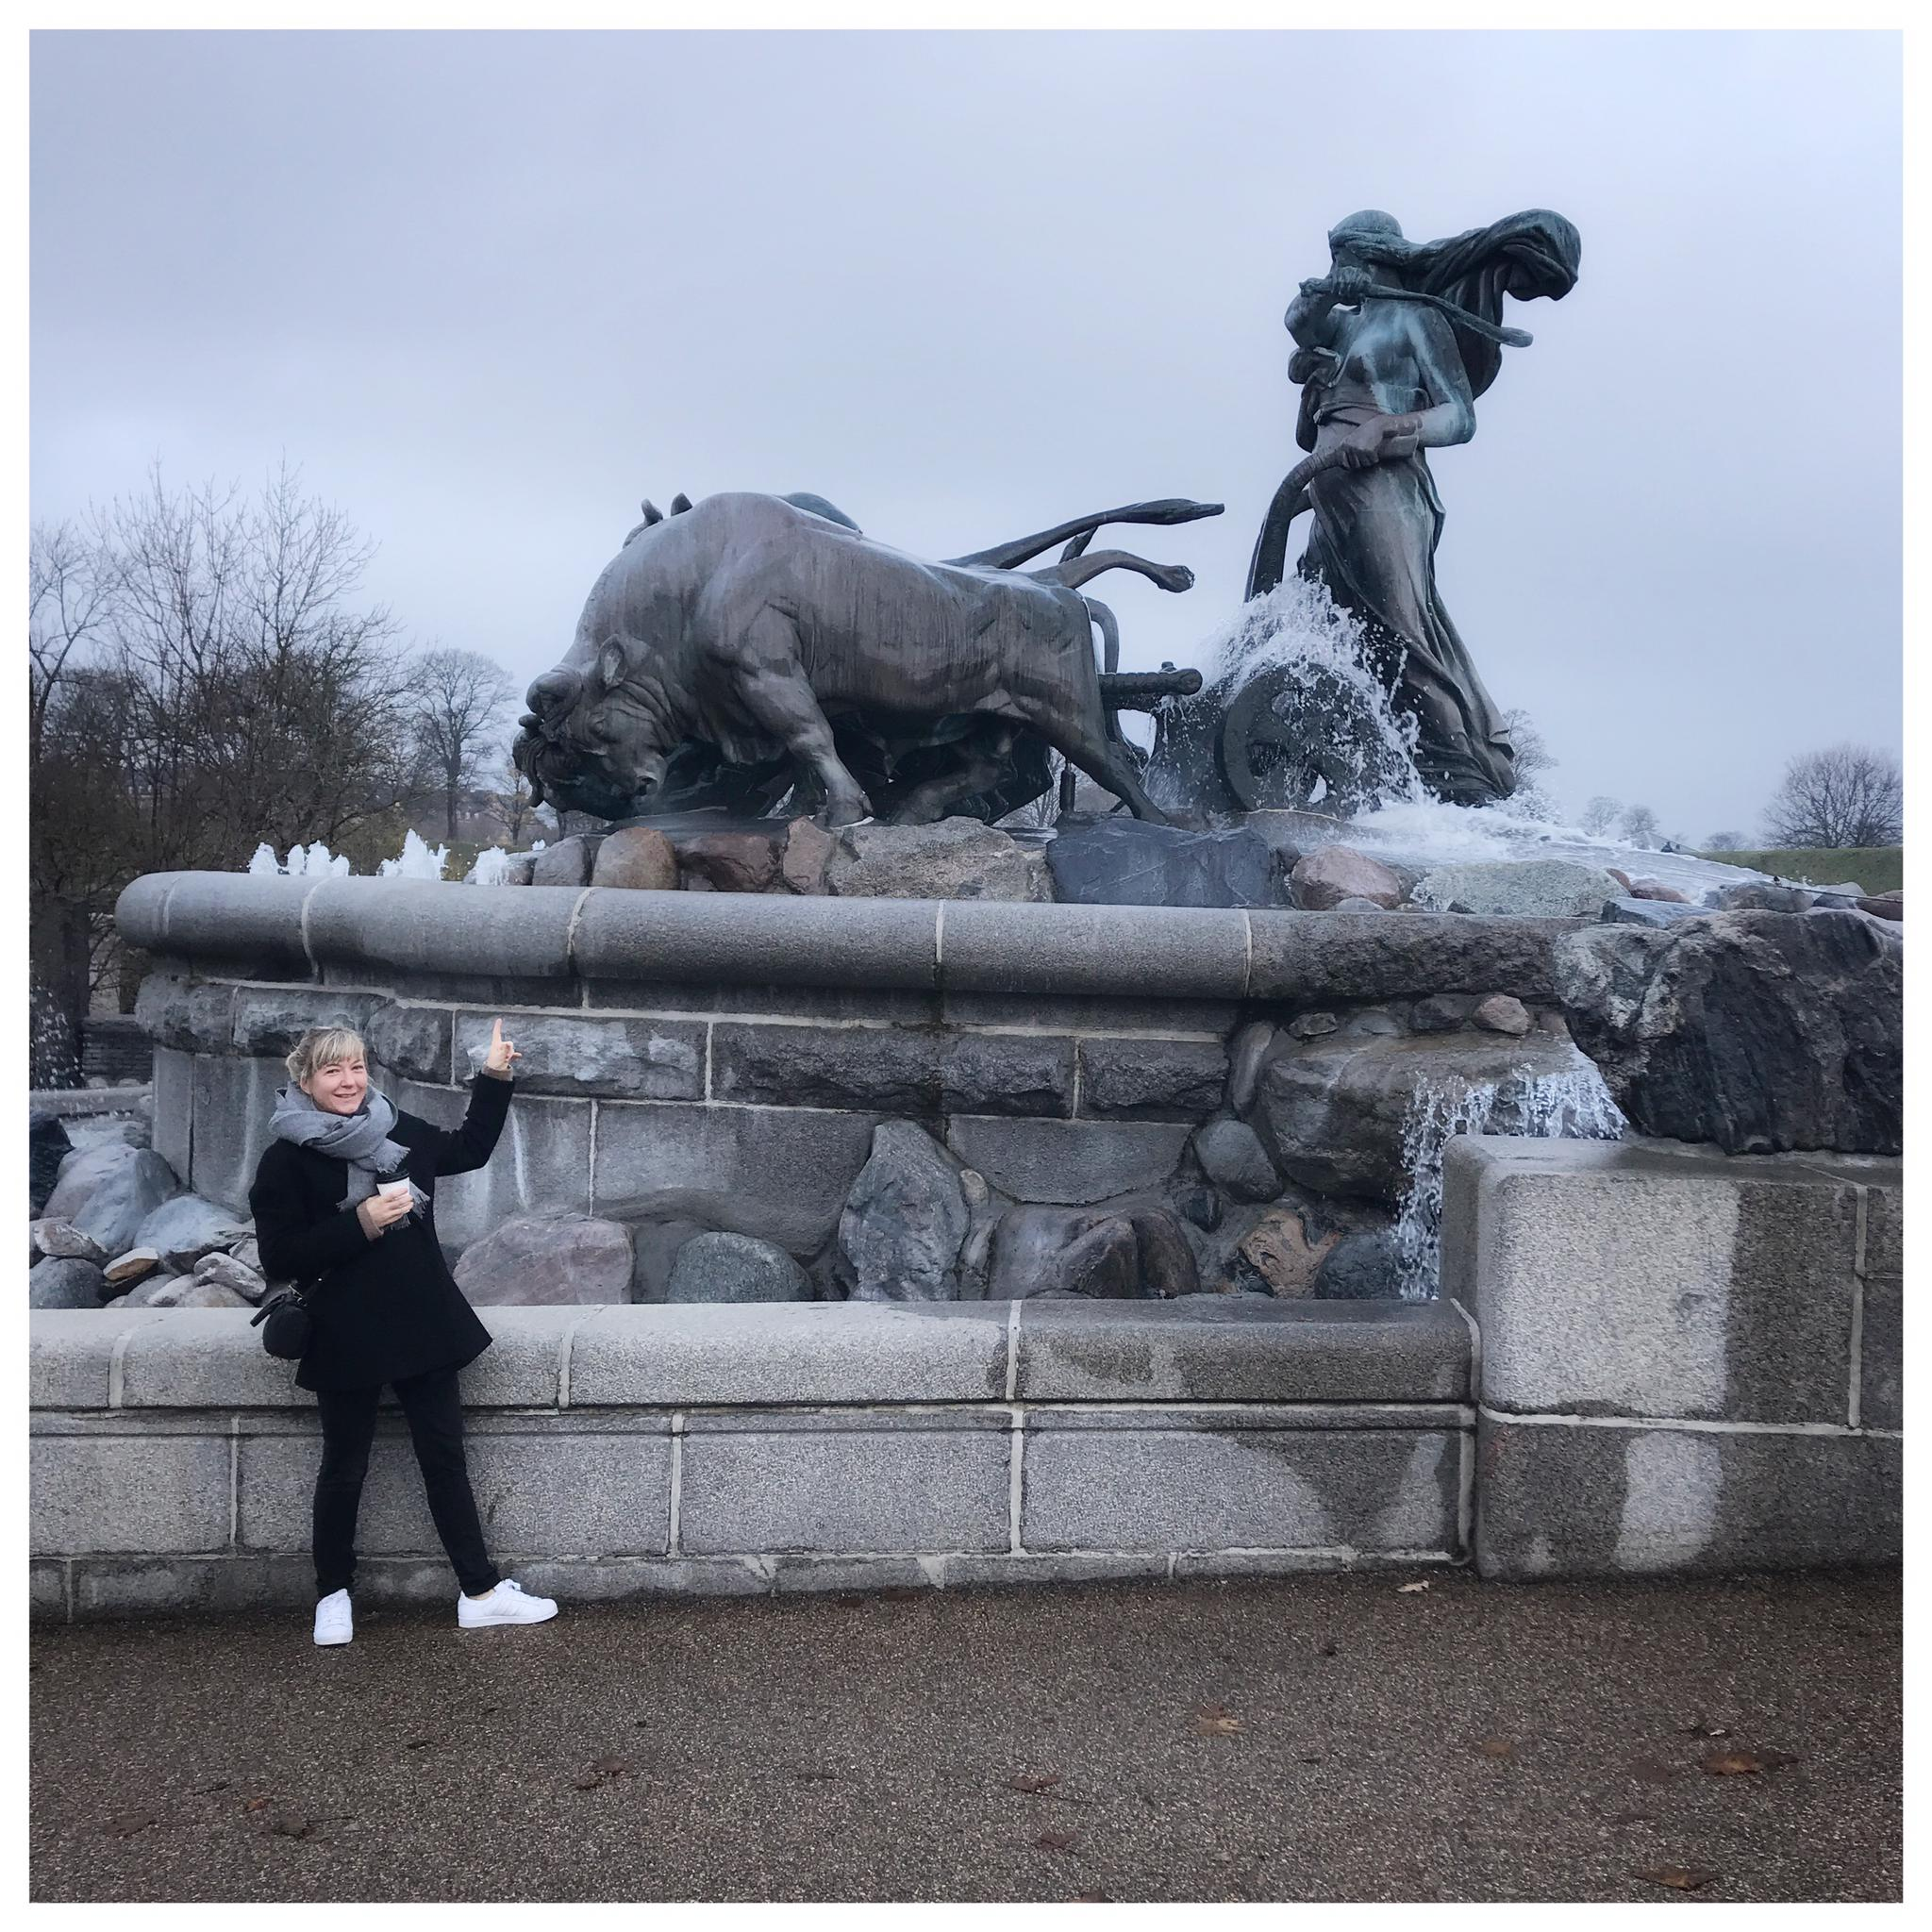 Julie Marie Kjersem standing in front of the Gefion Statue